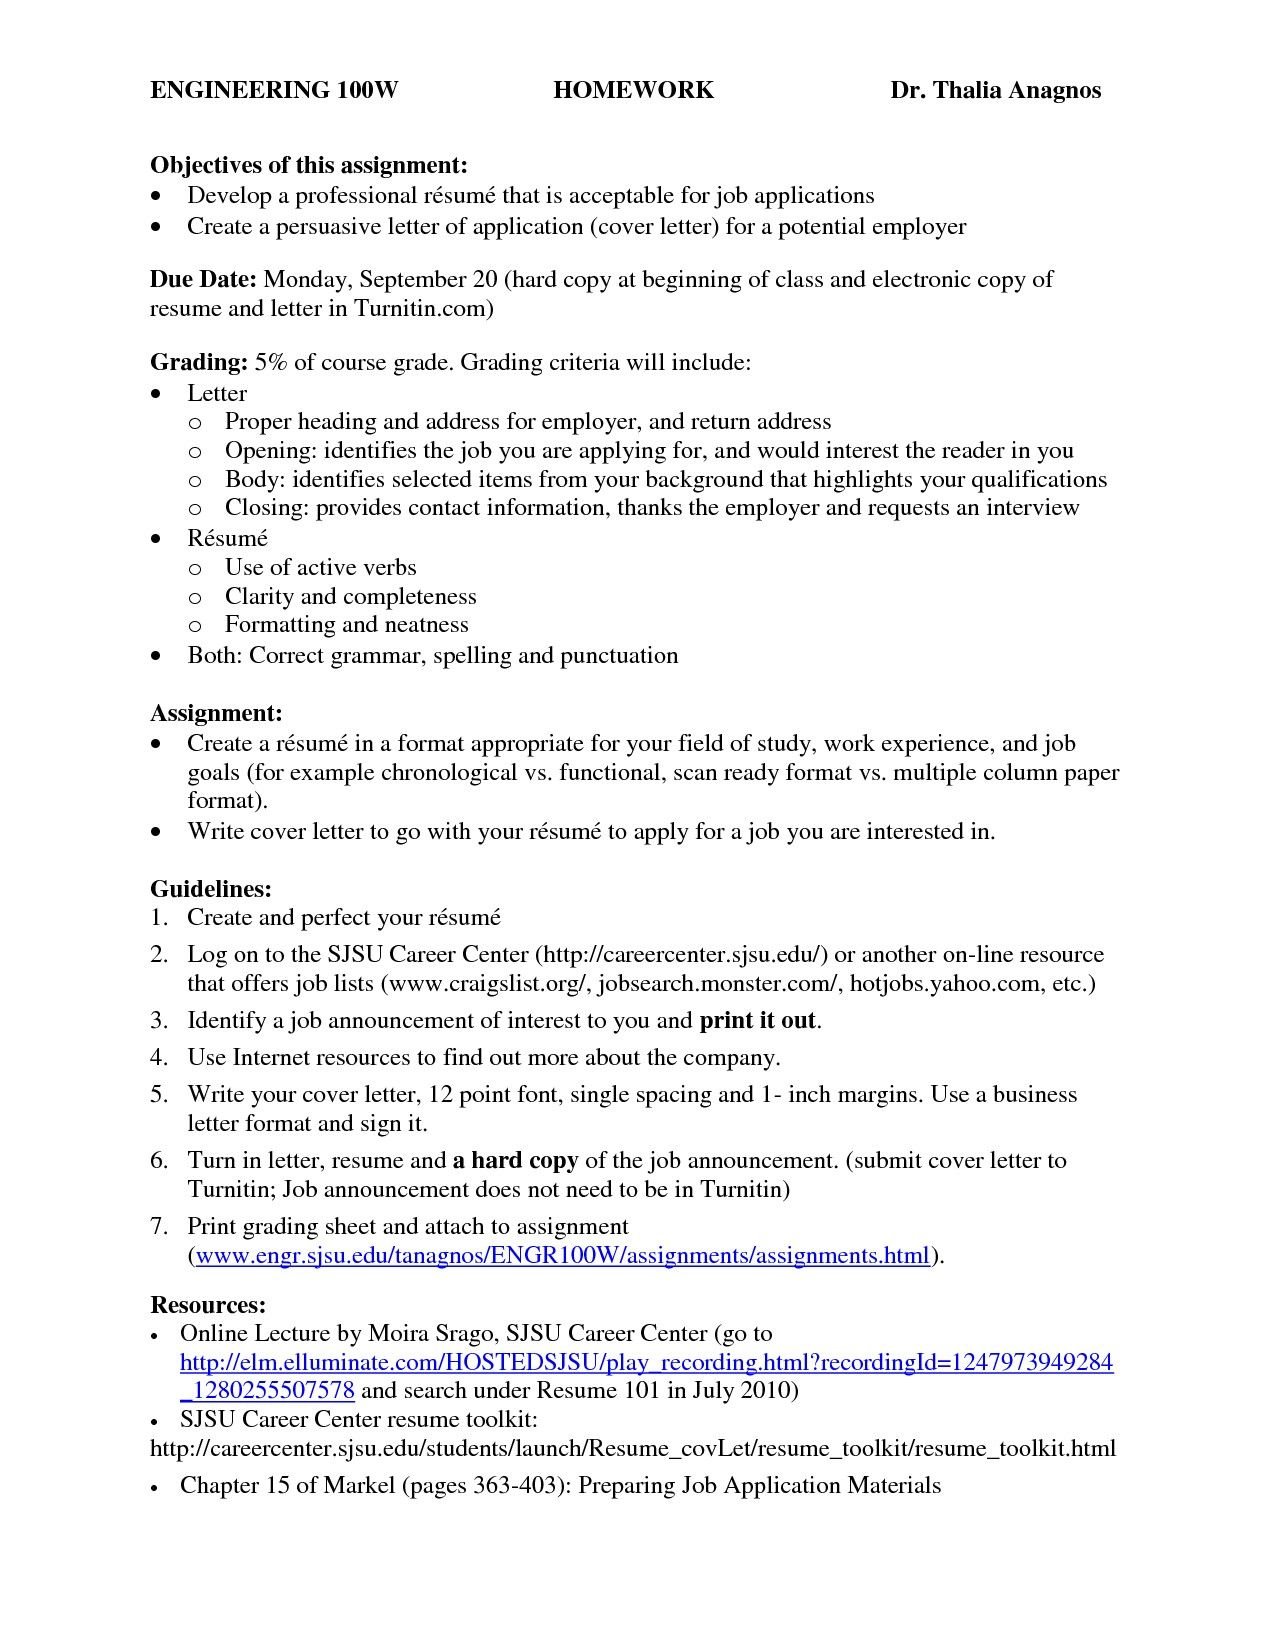 Purdue Owl Resume Format Persuasive Letter Application Cover